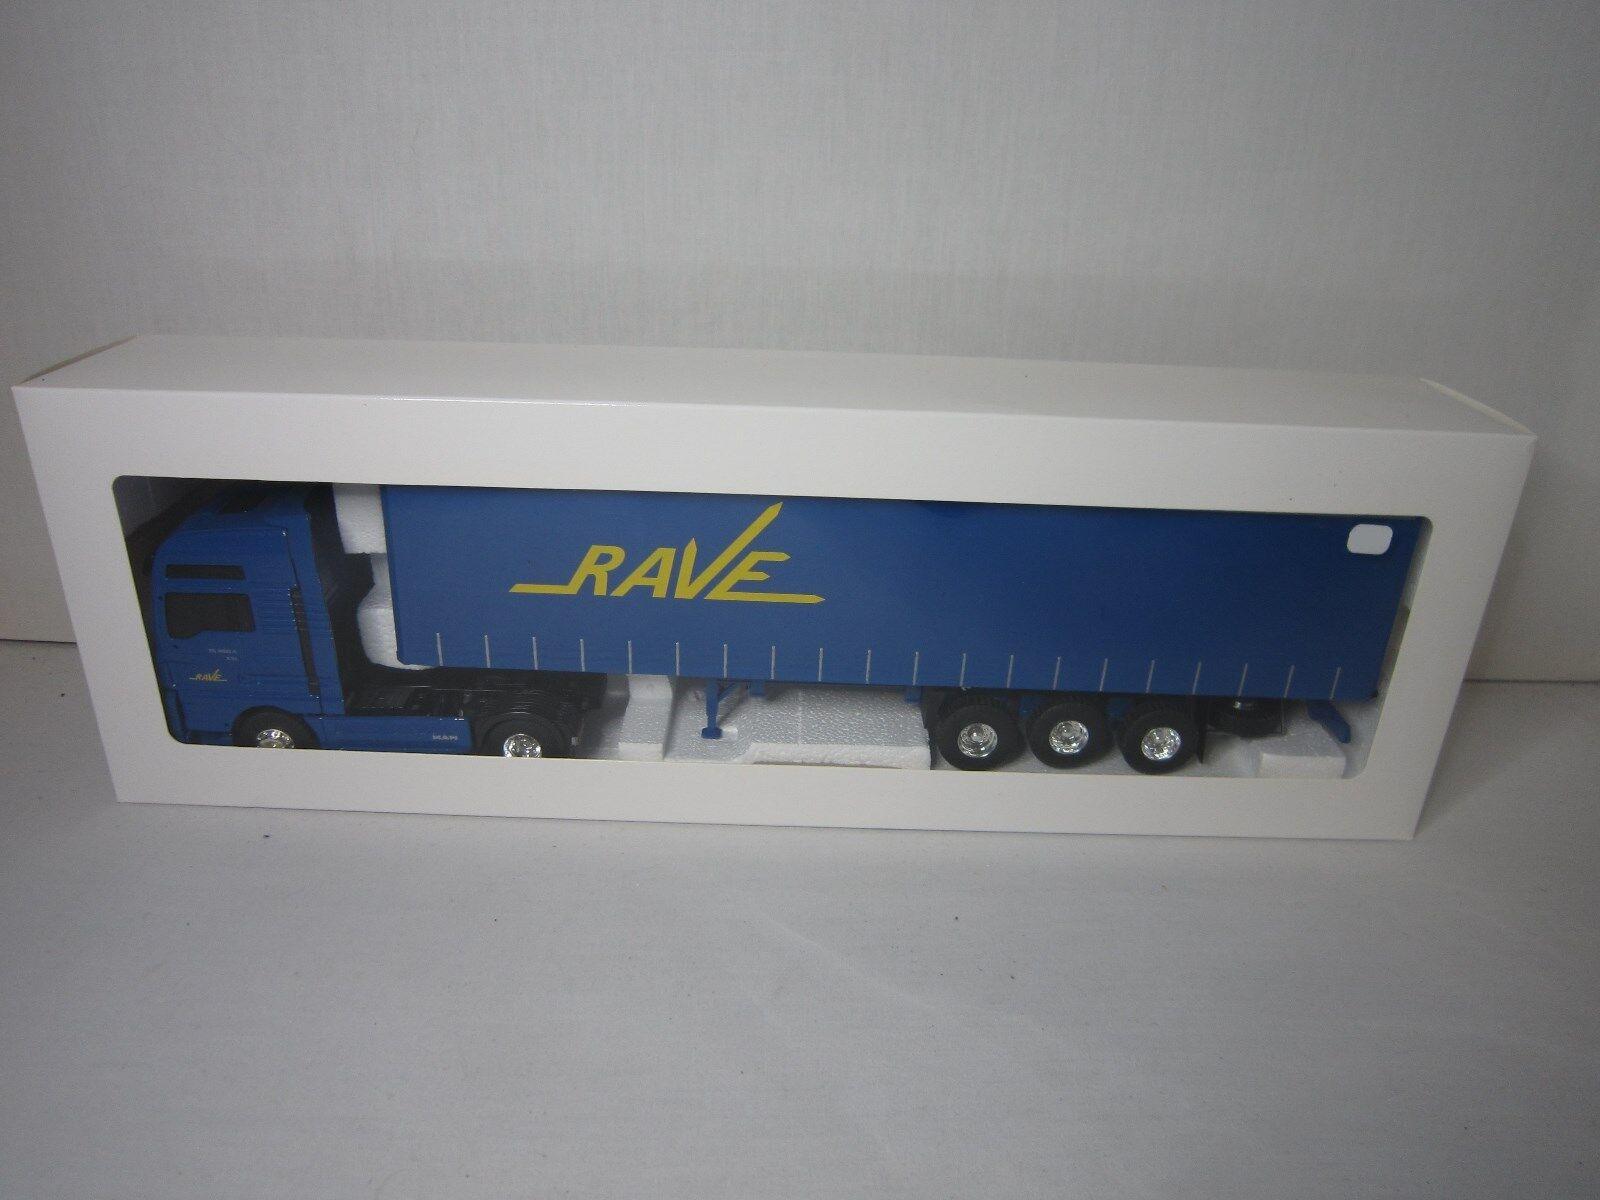 DV6950 ELIGOR 1 43 MAN TG XXL TRANSPORTS RAVE 113207 HORS COMMERCE